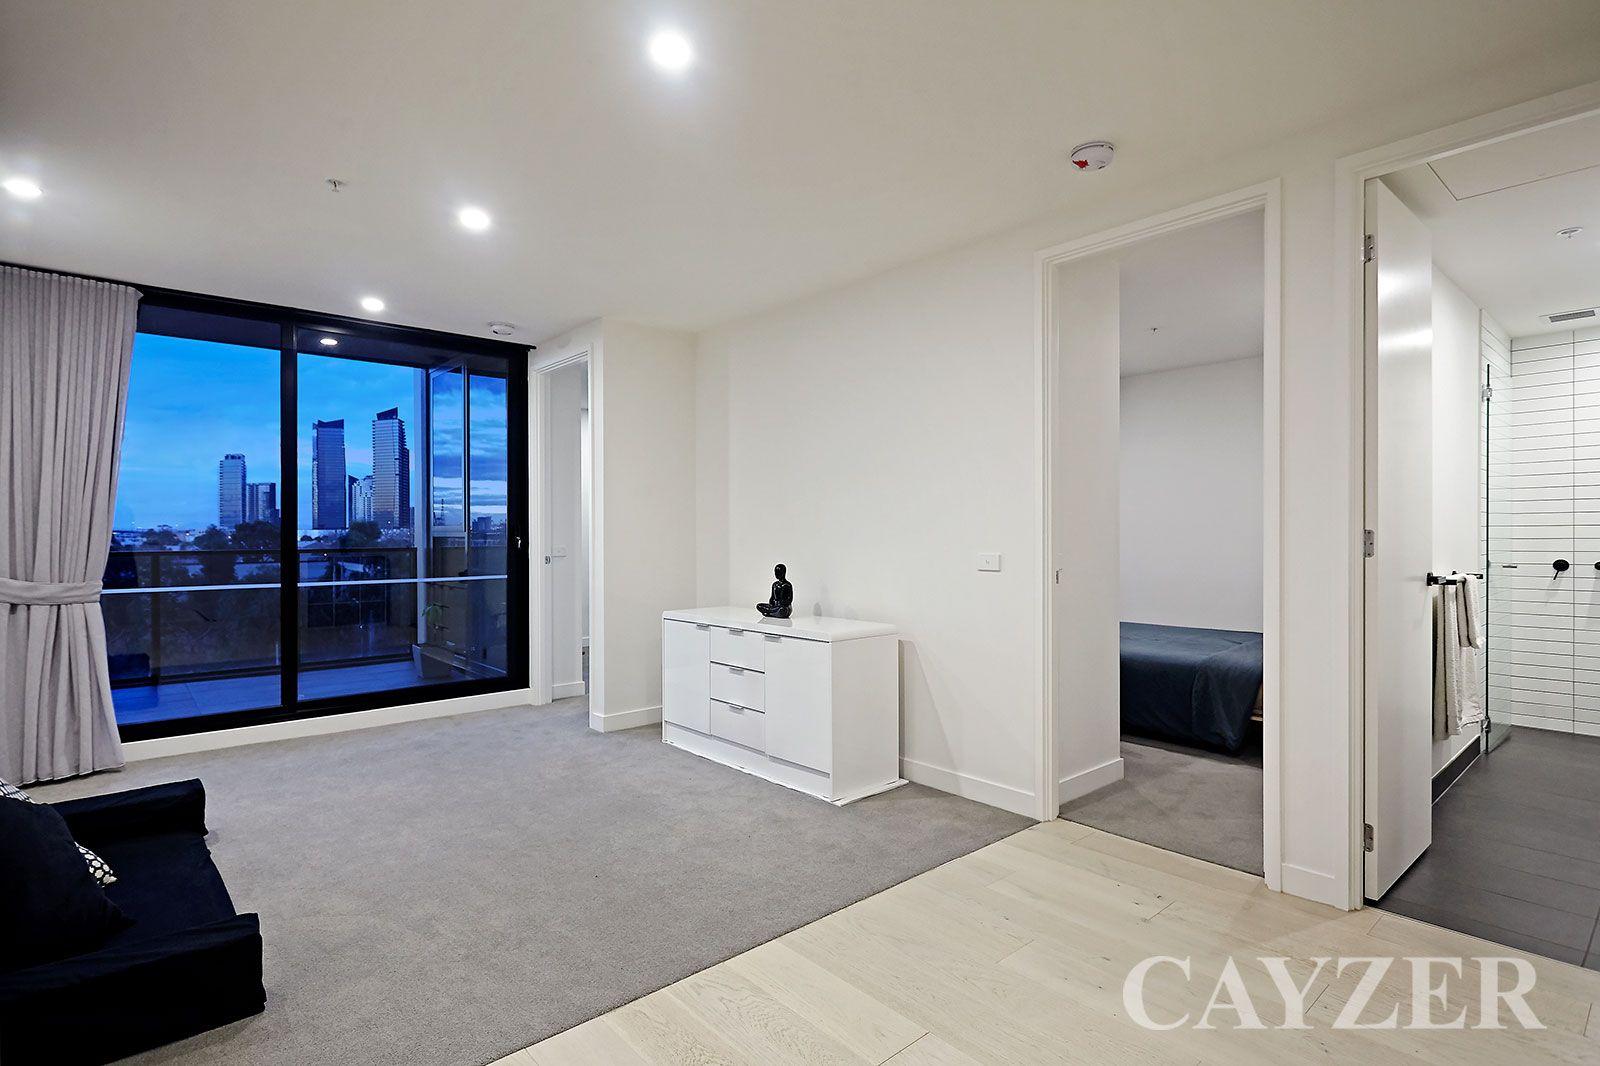 307/165 Gladstone Street, South Melbourne VIC 3205, Image 0